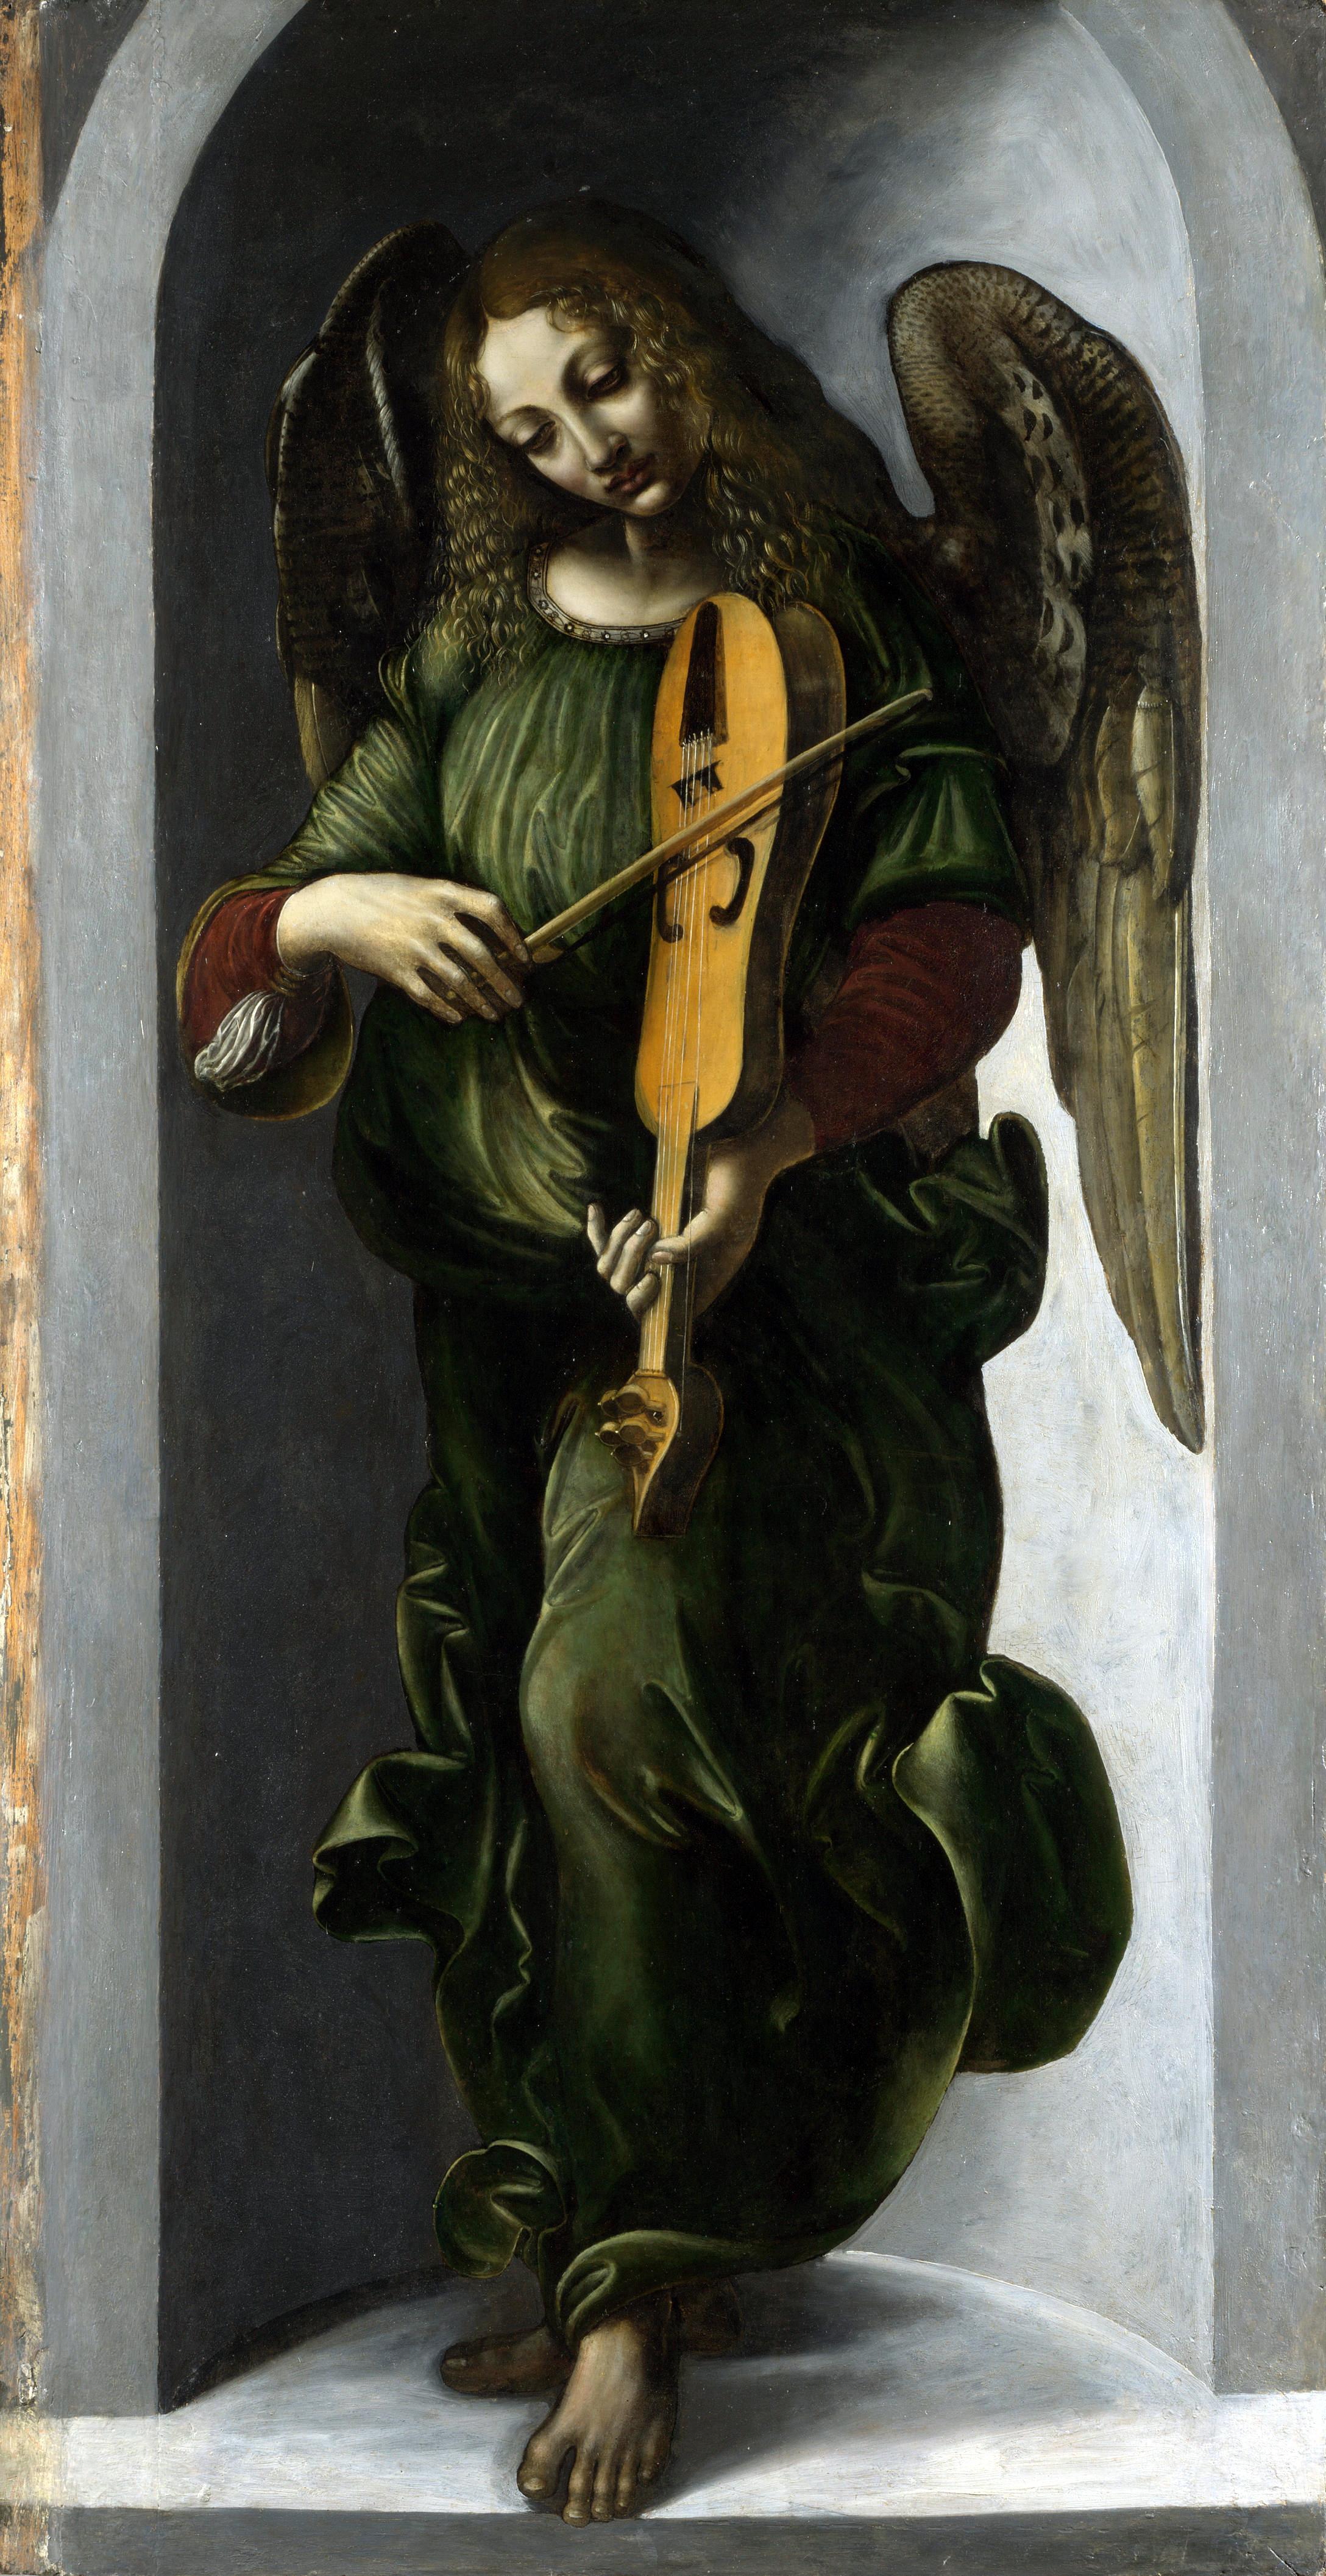 Leonardo da Vinci Painting, Anatomical, Painting, History, Human, HQ Photo